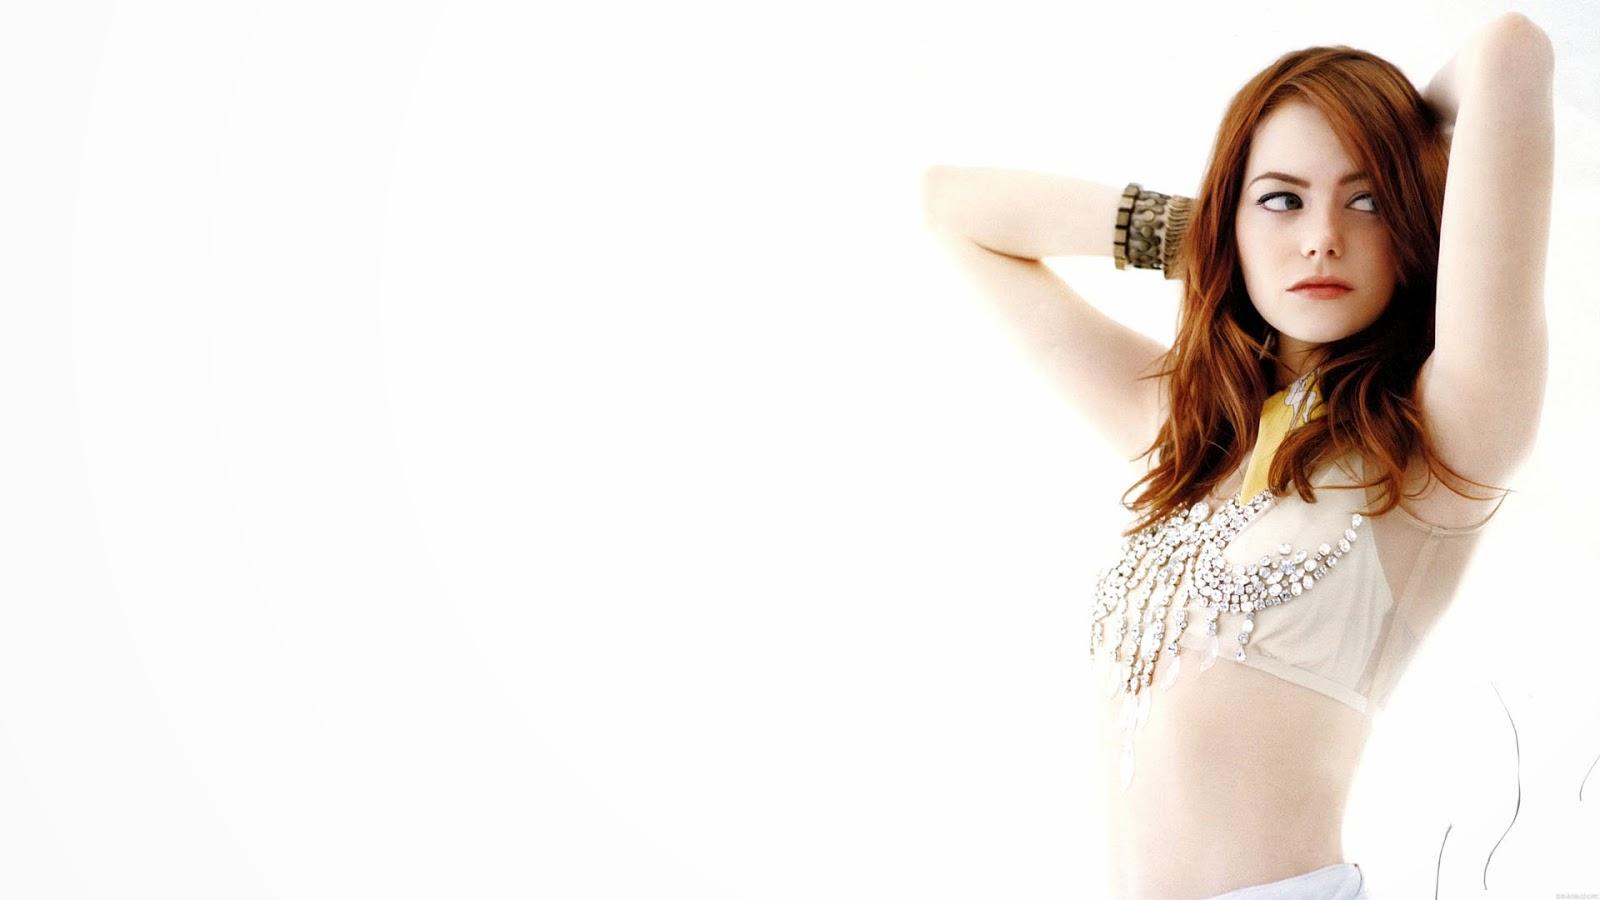 Film Stars World Emma Stone Hot Hd Wallpaper 1080p